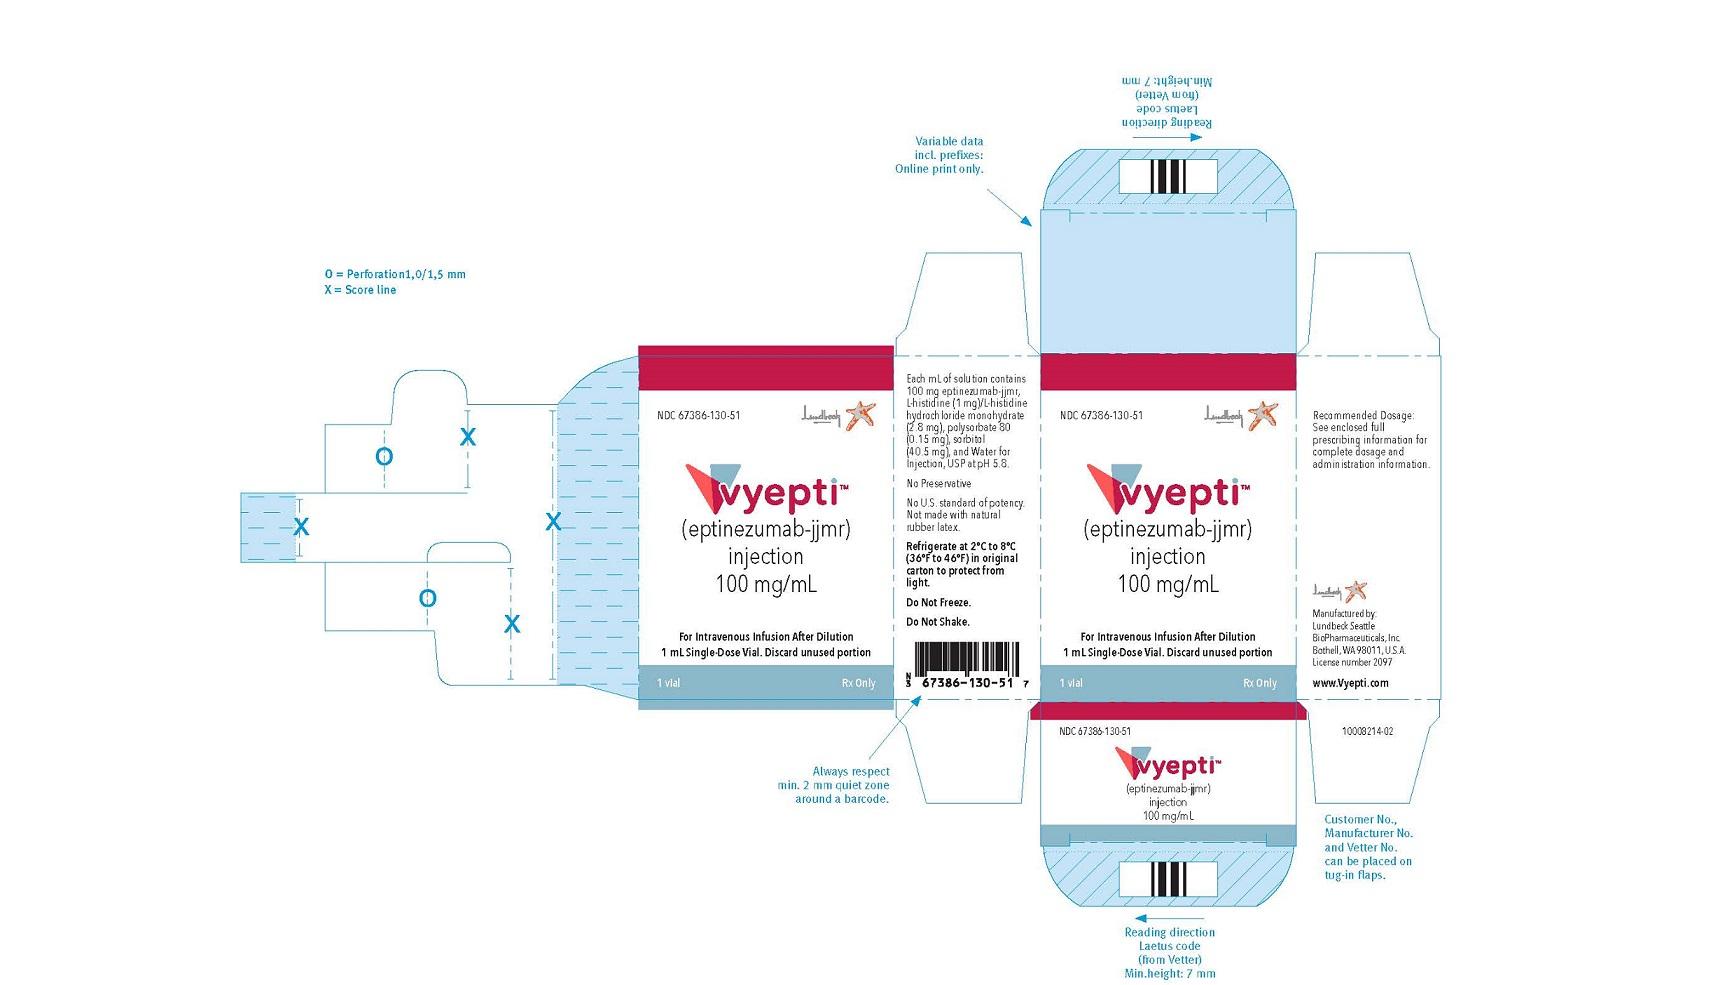 NDC: <a href=/NDC/67386-130-51>67386-130-51</a> VYEPTITM (vye ep' tee) (eptinezumab-jjmr) injection, for intravenous use 100 mg/mL injection, for intravenous use 100 mg/mL